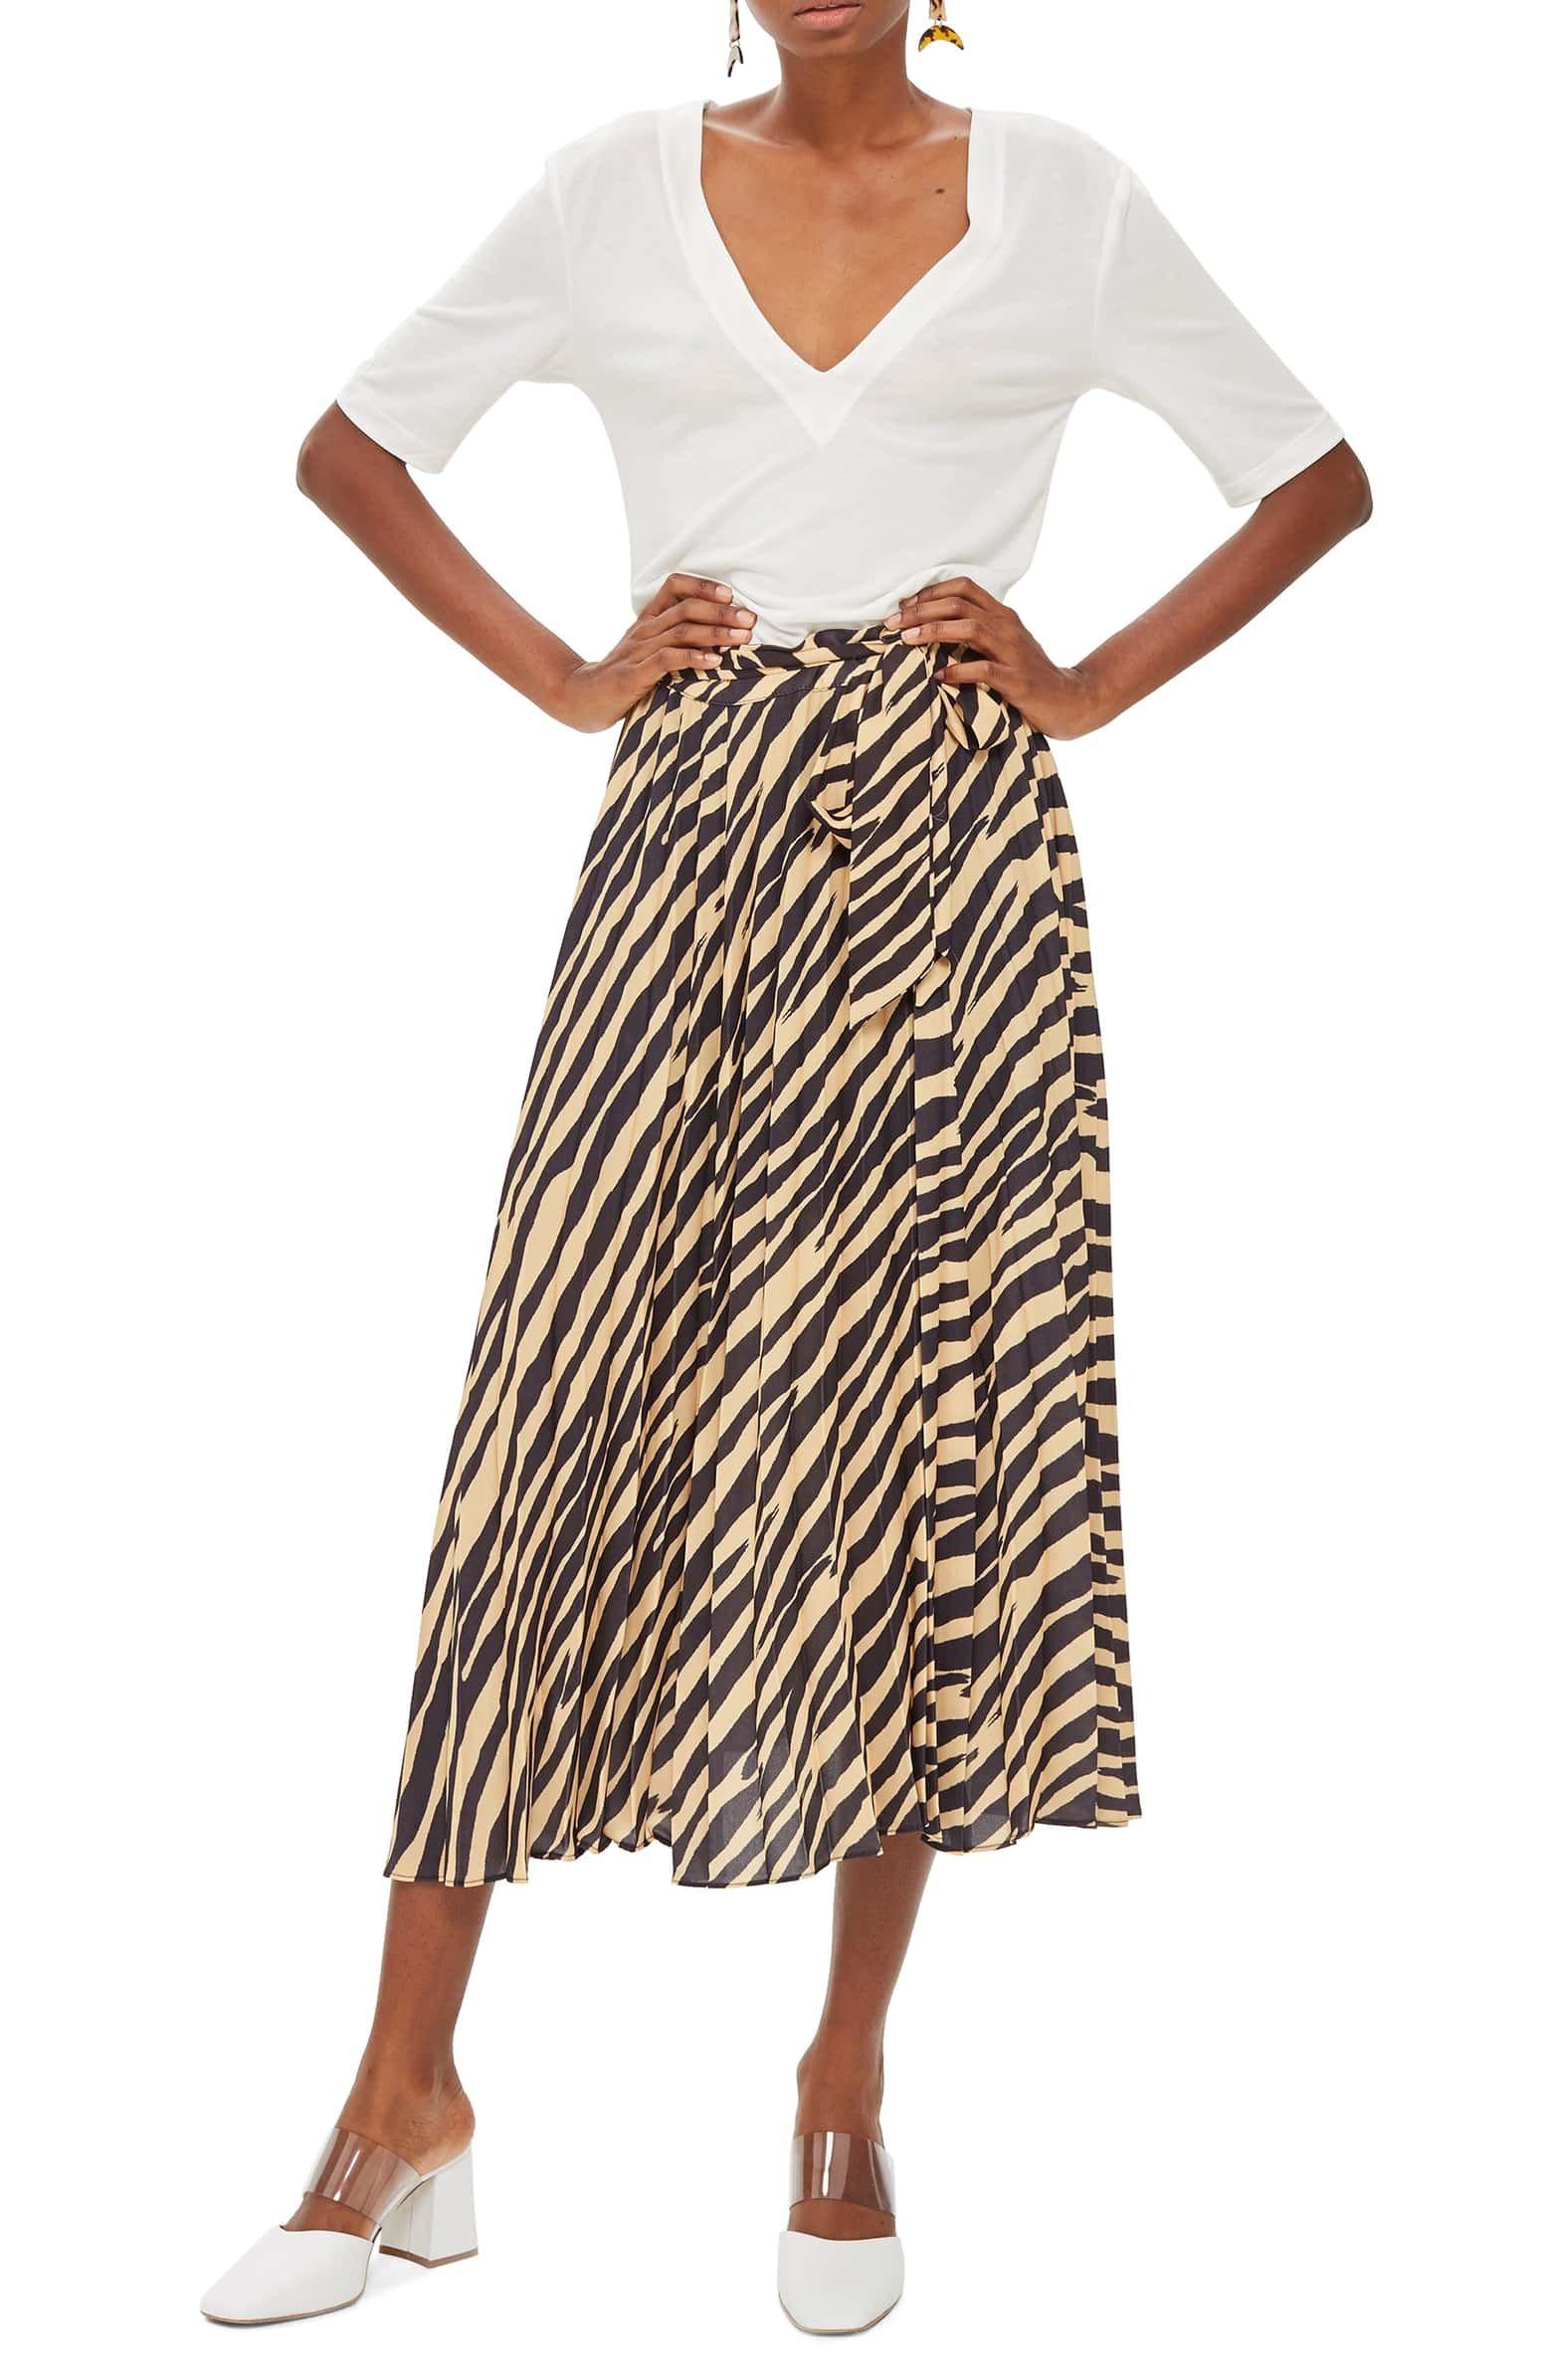 649c0812a Zebra Print Pleated Midi Wrap Skirt, Main, color, Black Multi ...